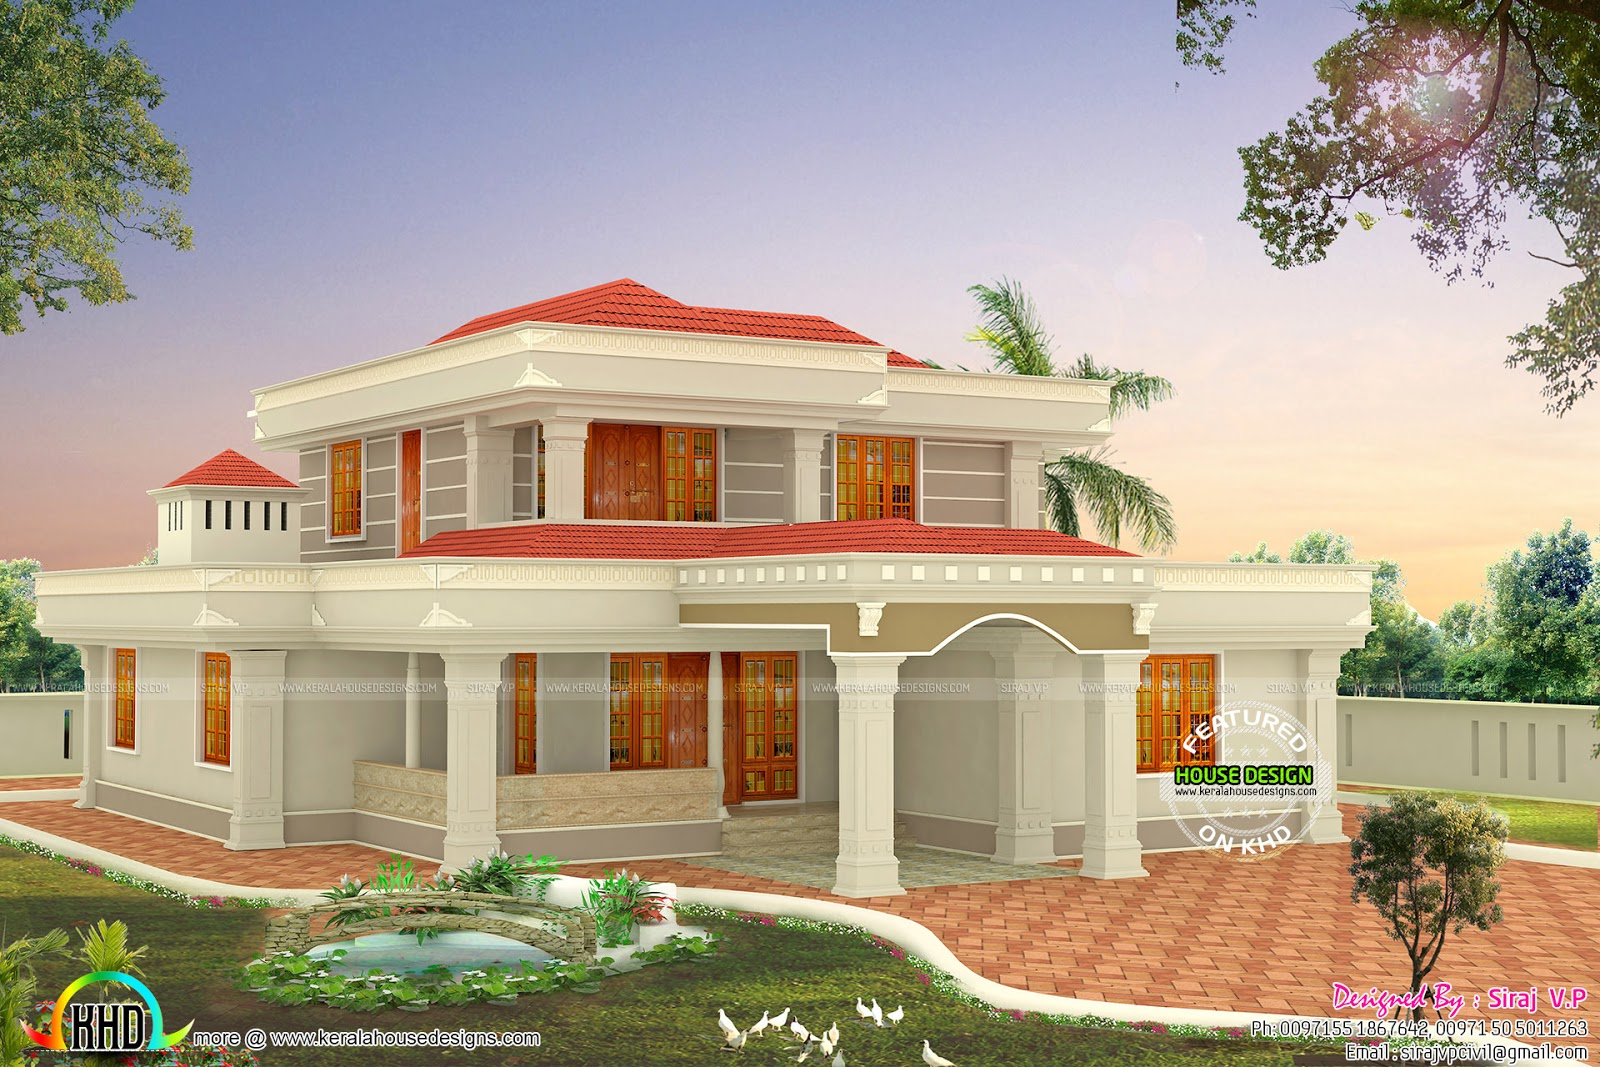 5 Bedroom 2800 Sq Ft Modern Home Kerala Home Design